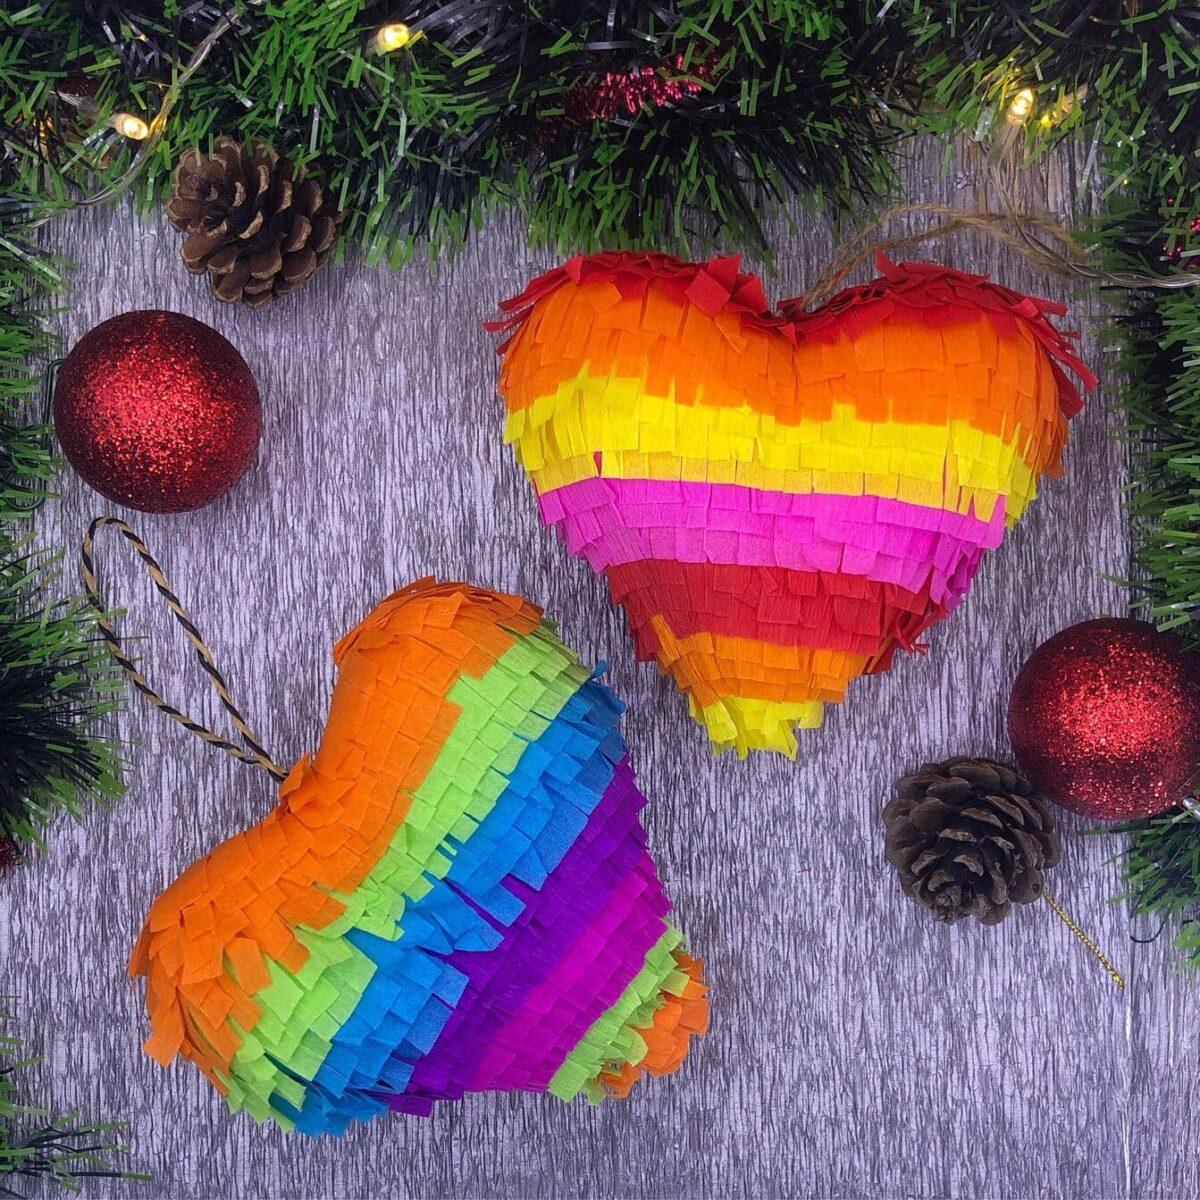 decorazioni-natalizie-carta-crespa-4